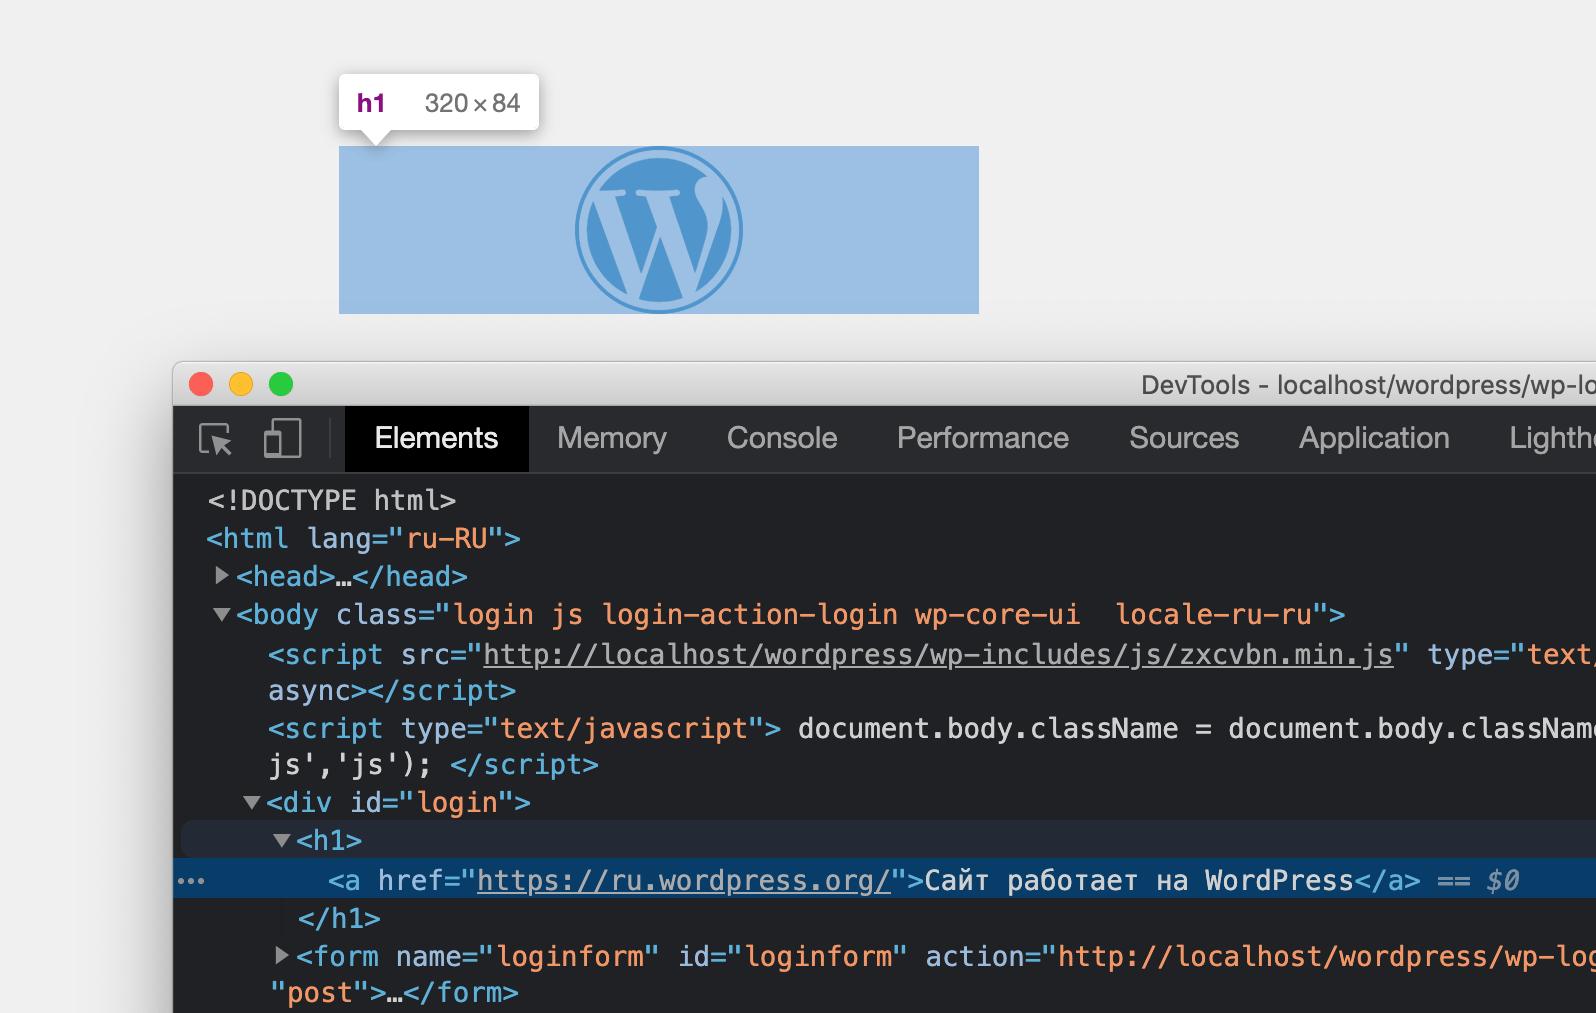 Логотип WordPress в инспекторе Google Chrome